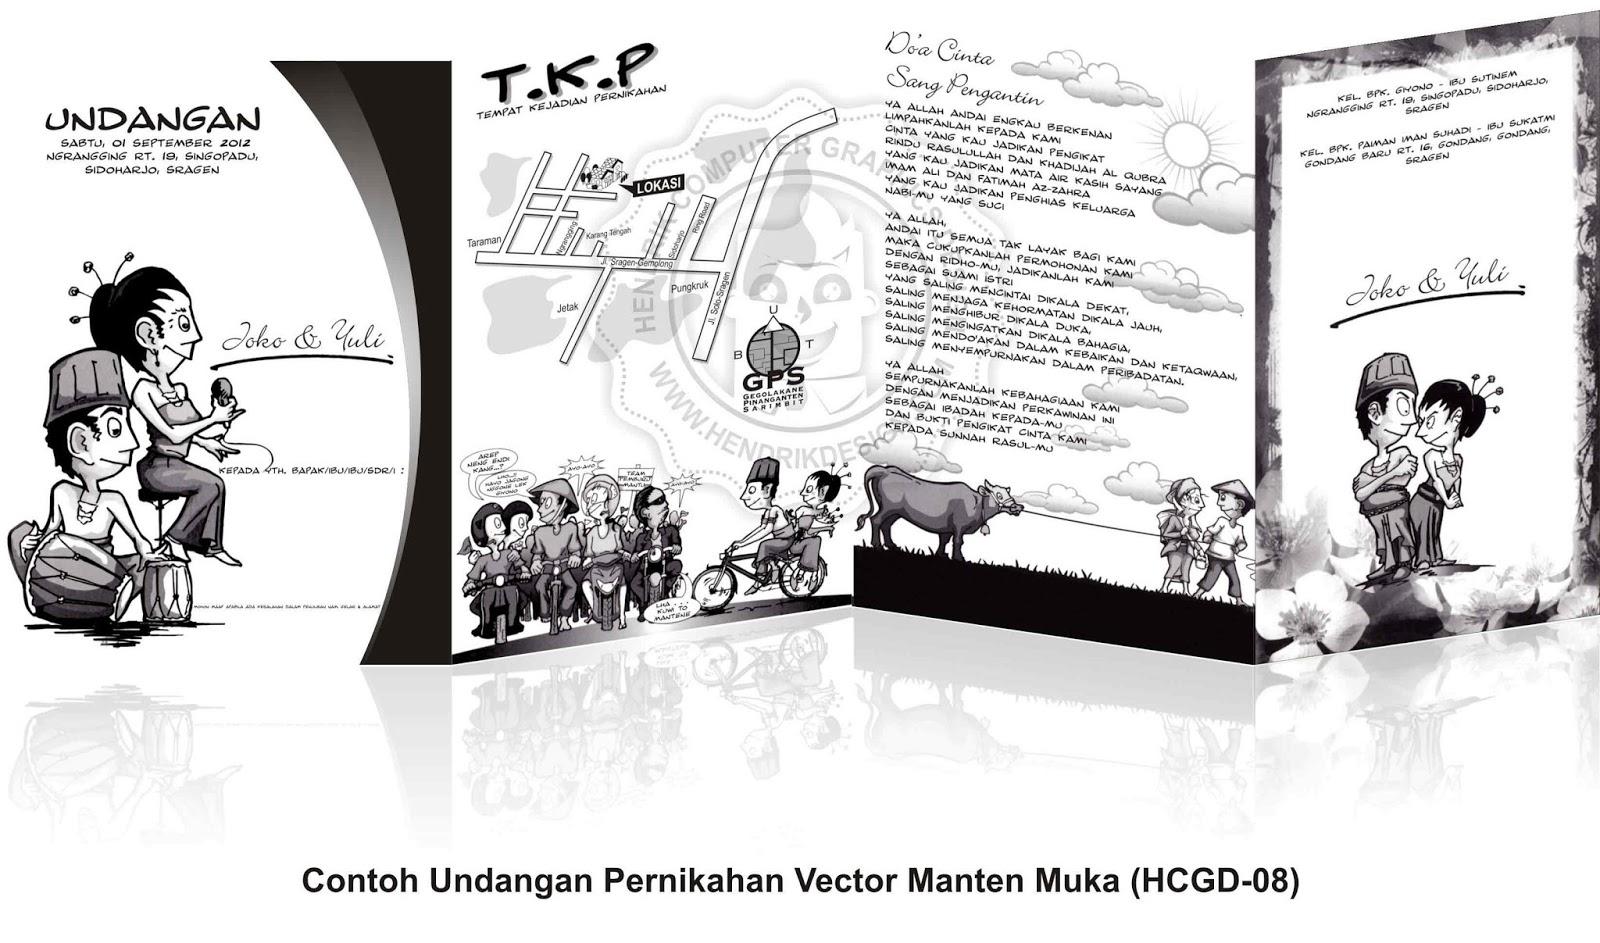 Contoh Undangan Pernikahan Vector Manten HCGD 08 Online